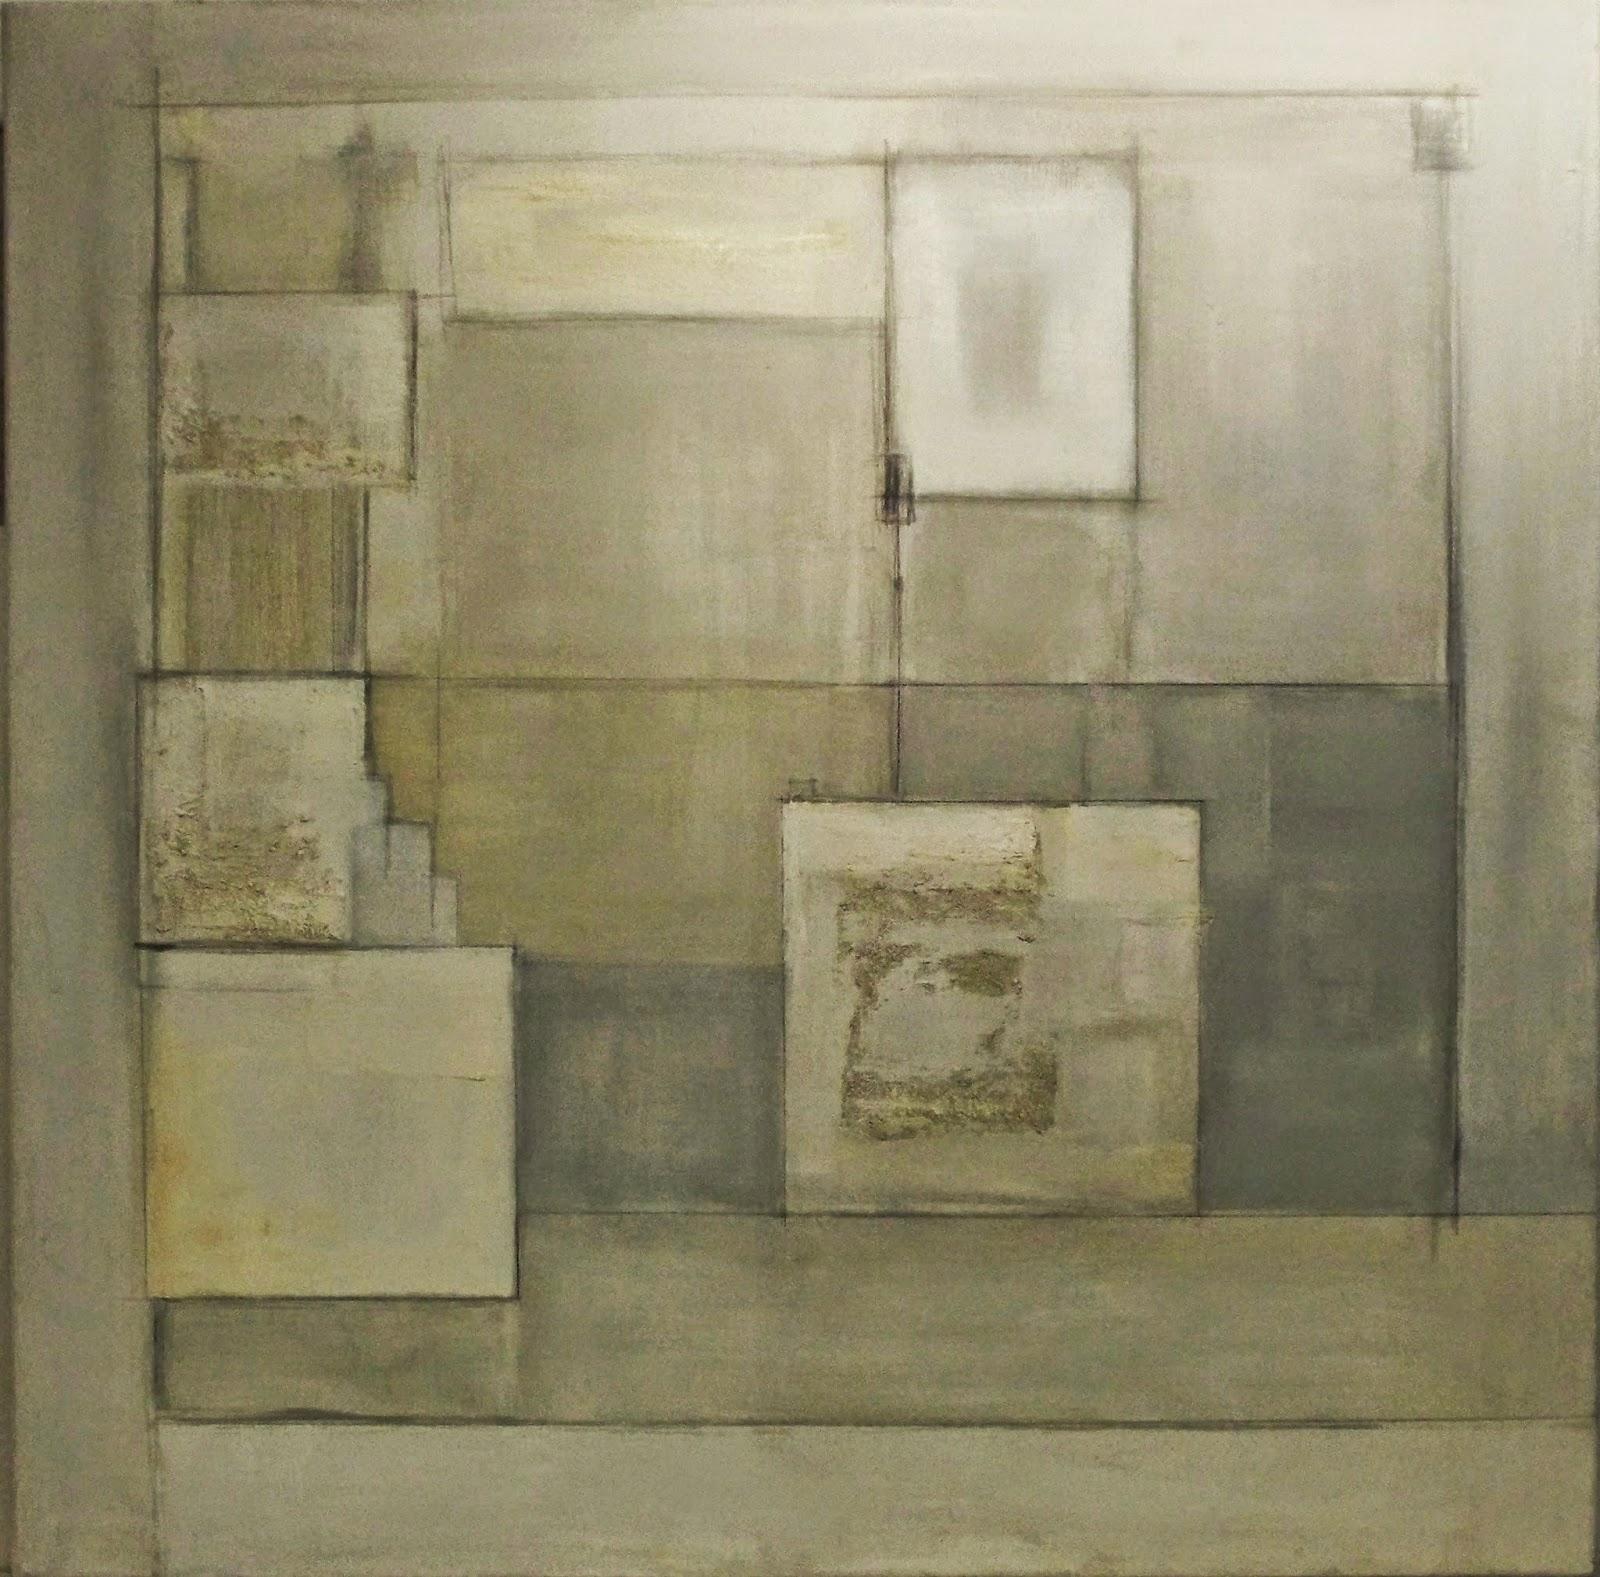 Pinturas abstractas de vanina martinez blancas - Cuadros con texturas abstractos ...